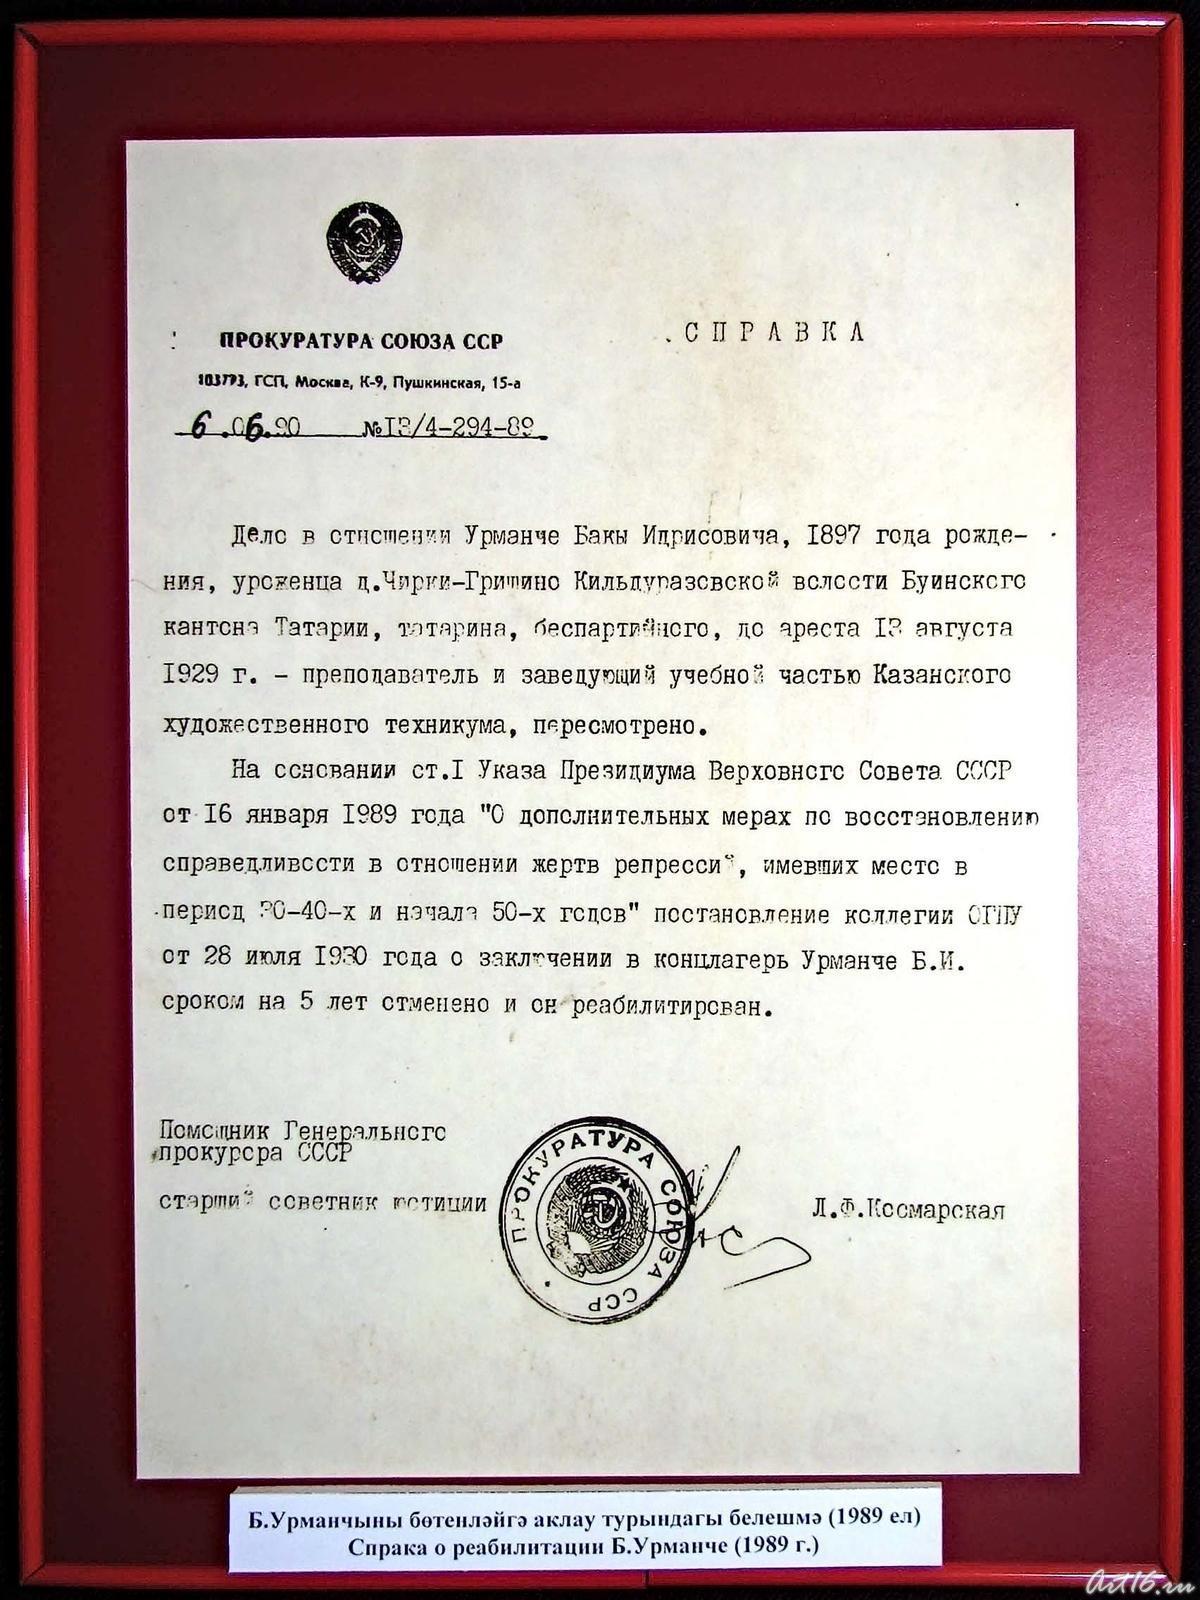 Фото №43396. Справка о реабилитации Баки Урманче. 1989 г.